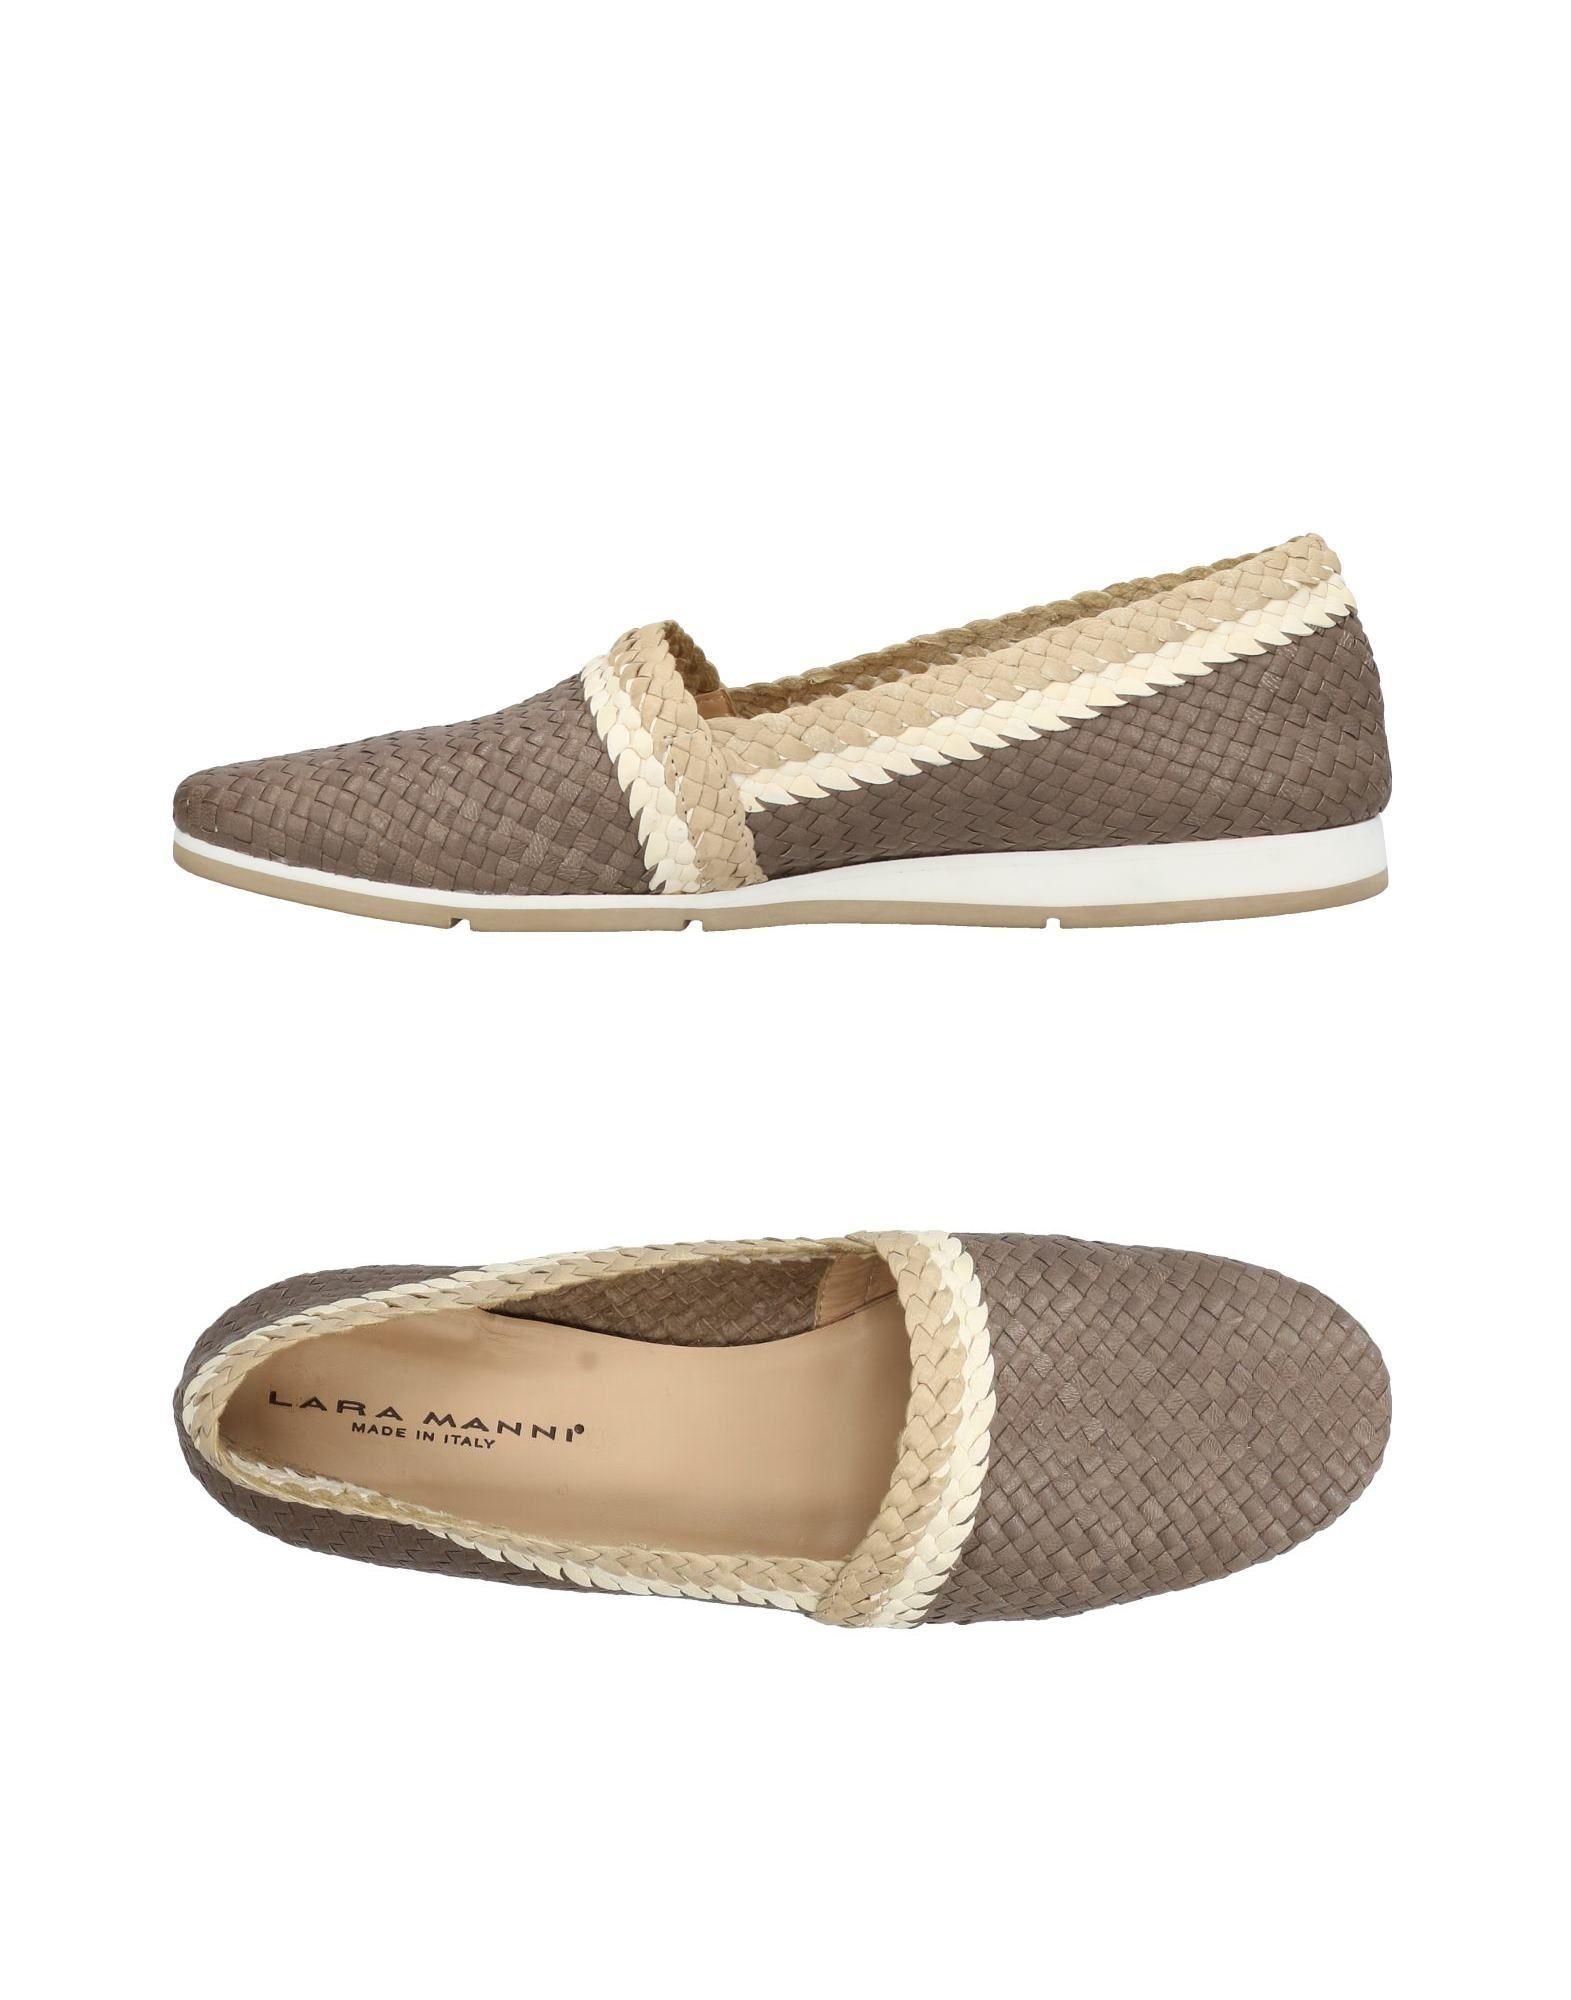 Chaussures - Mocassins Lara Manni R68CT